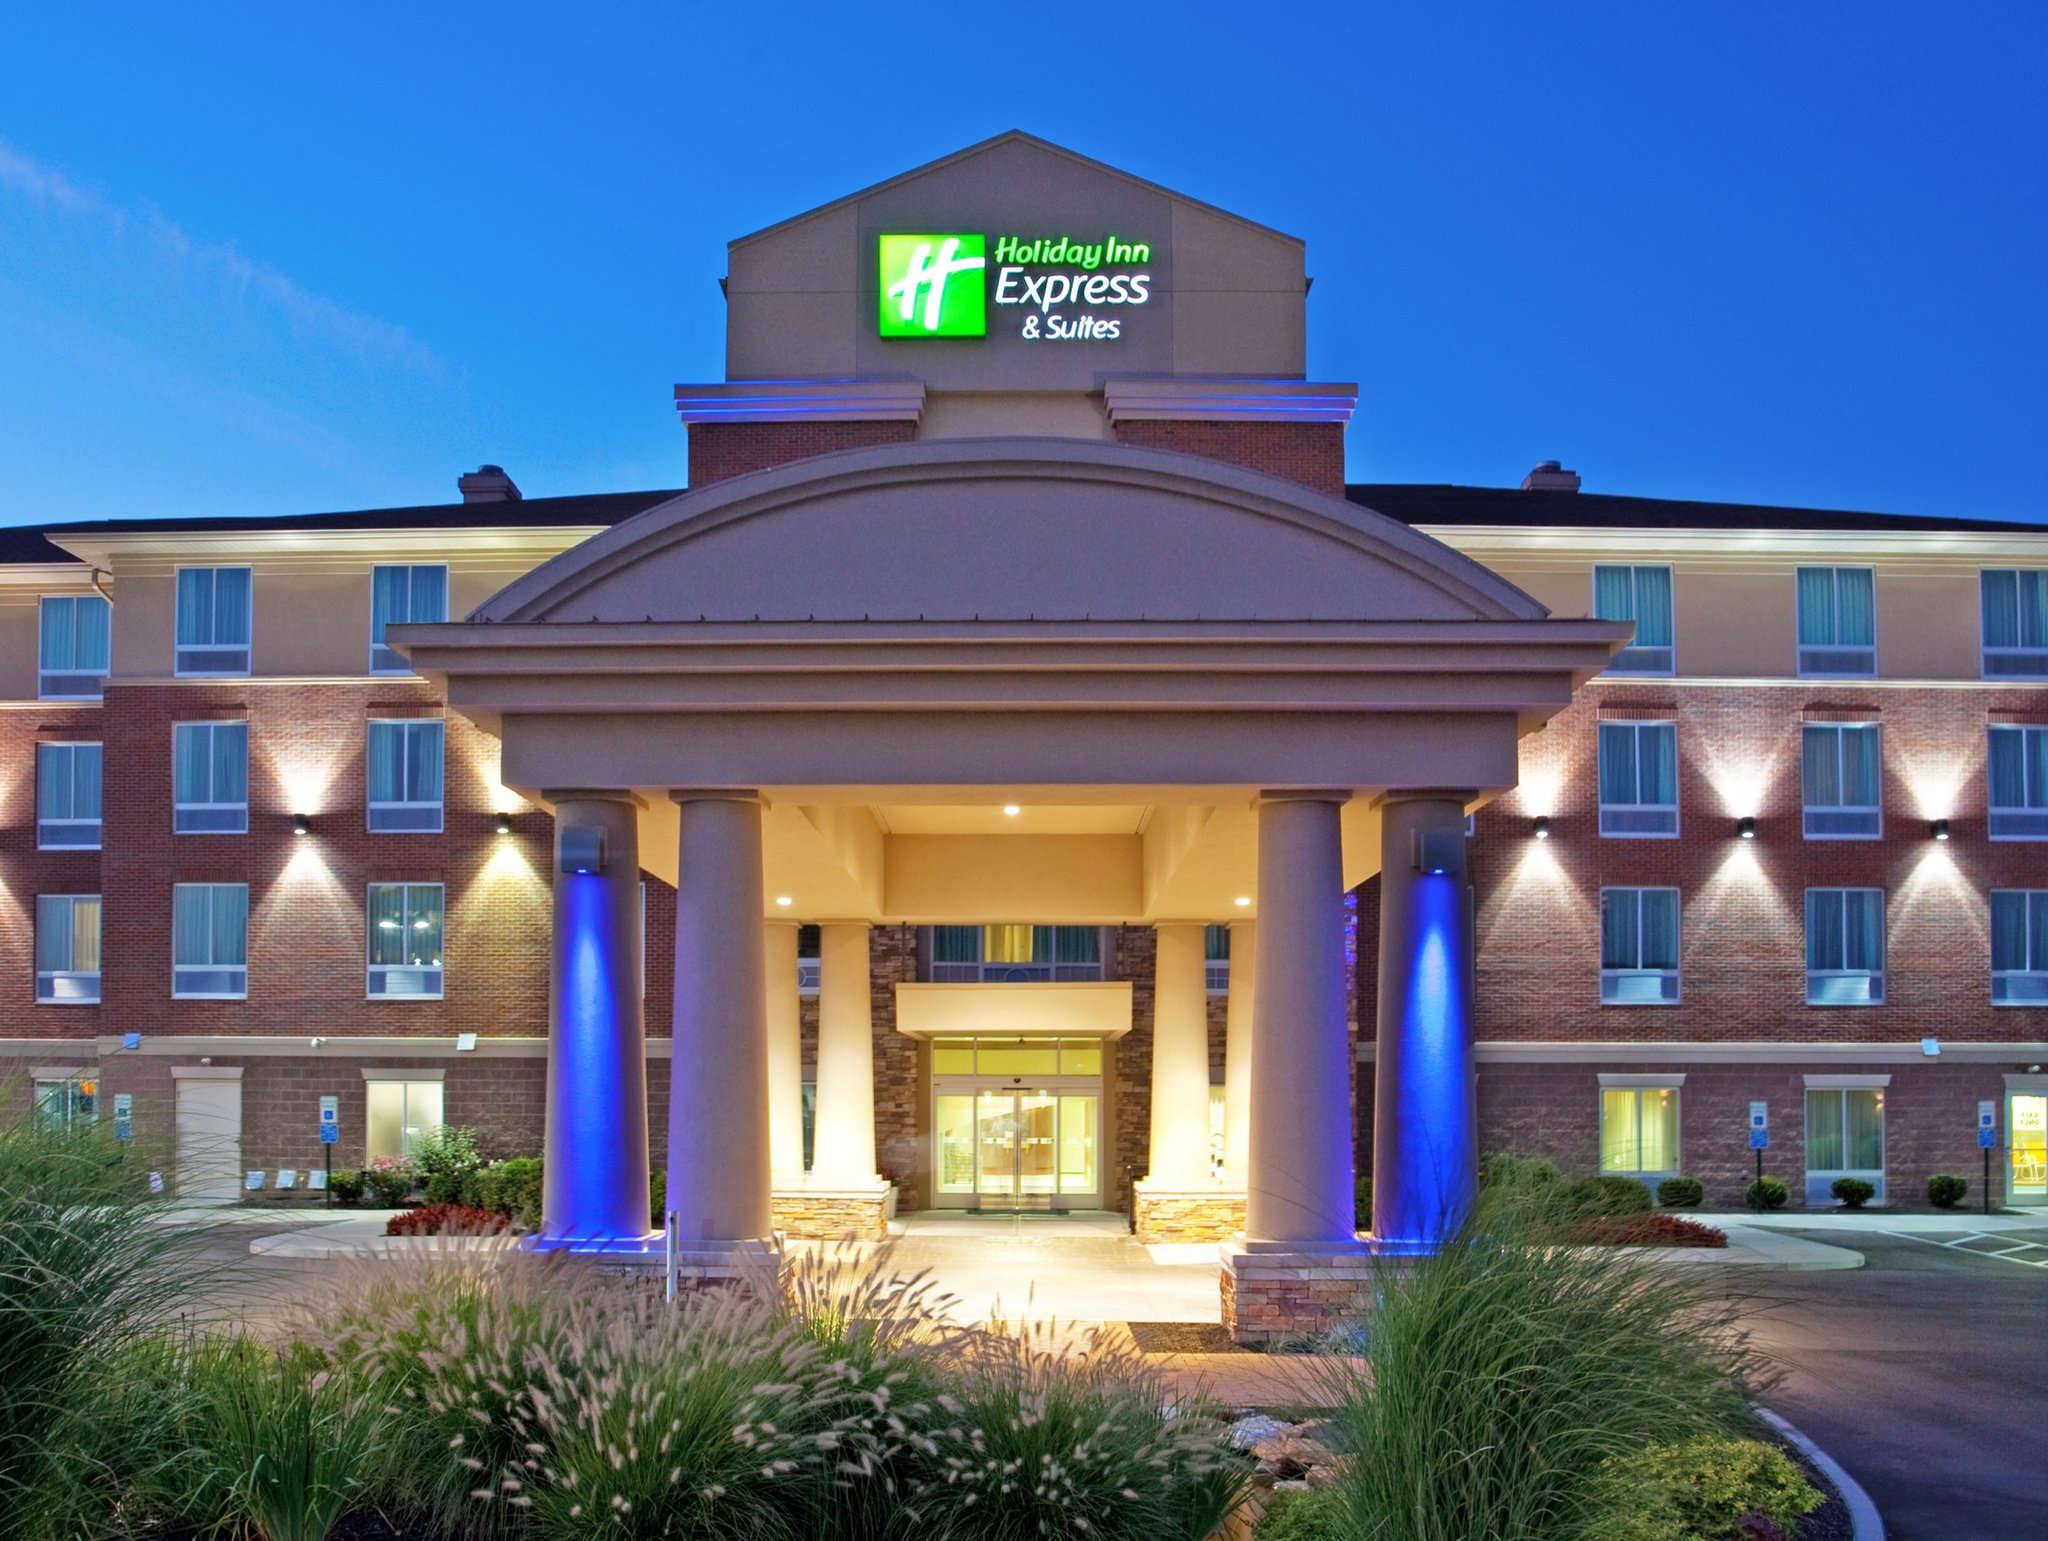 Holiday Inn Express & Suites Mason